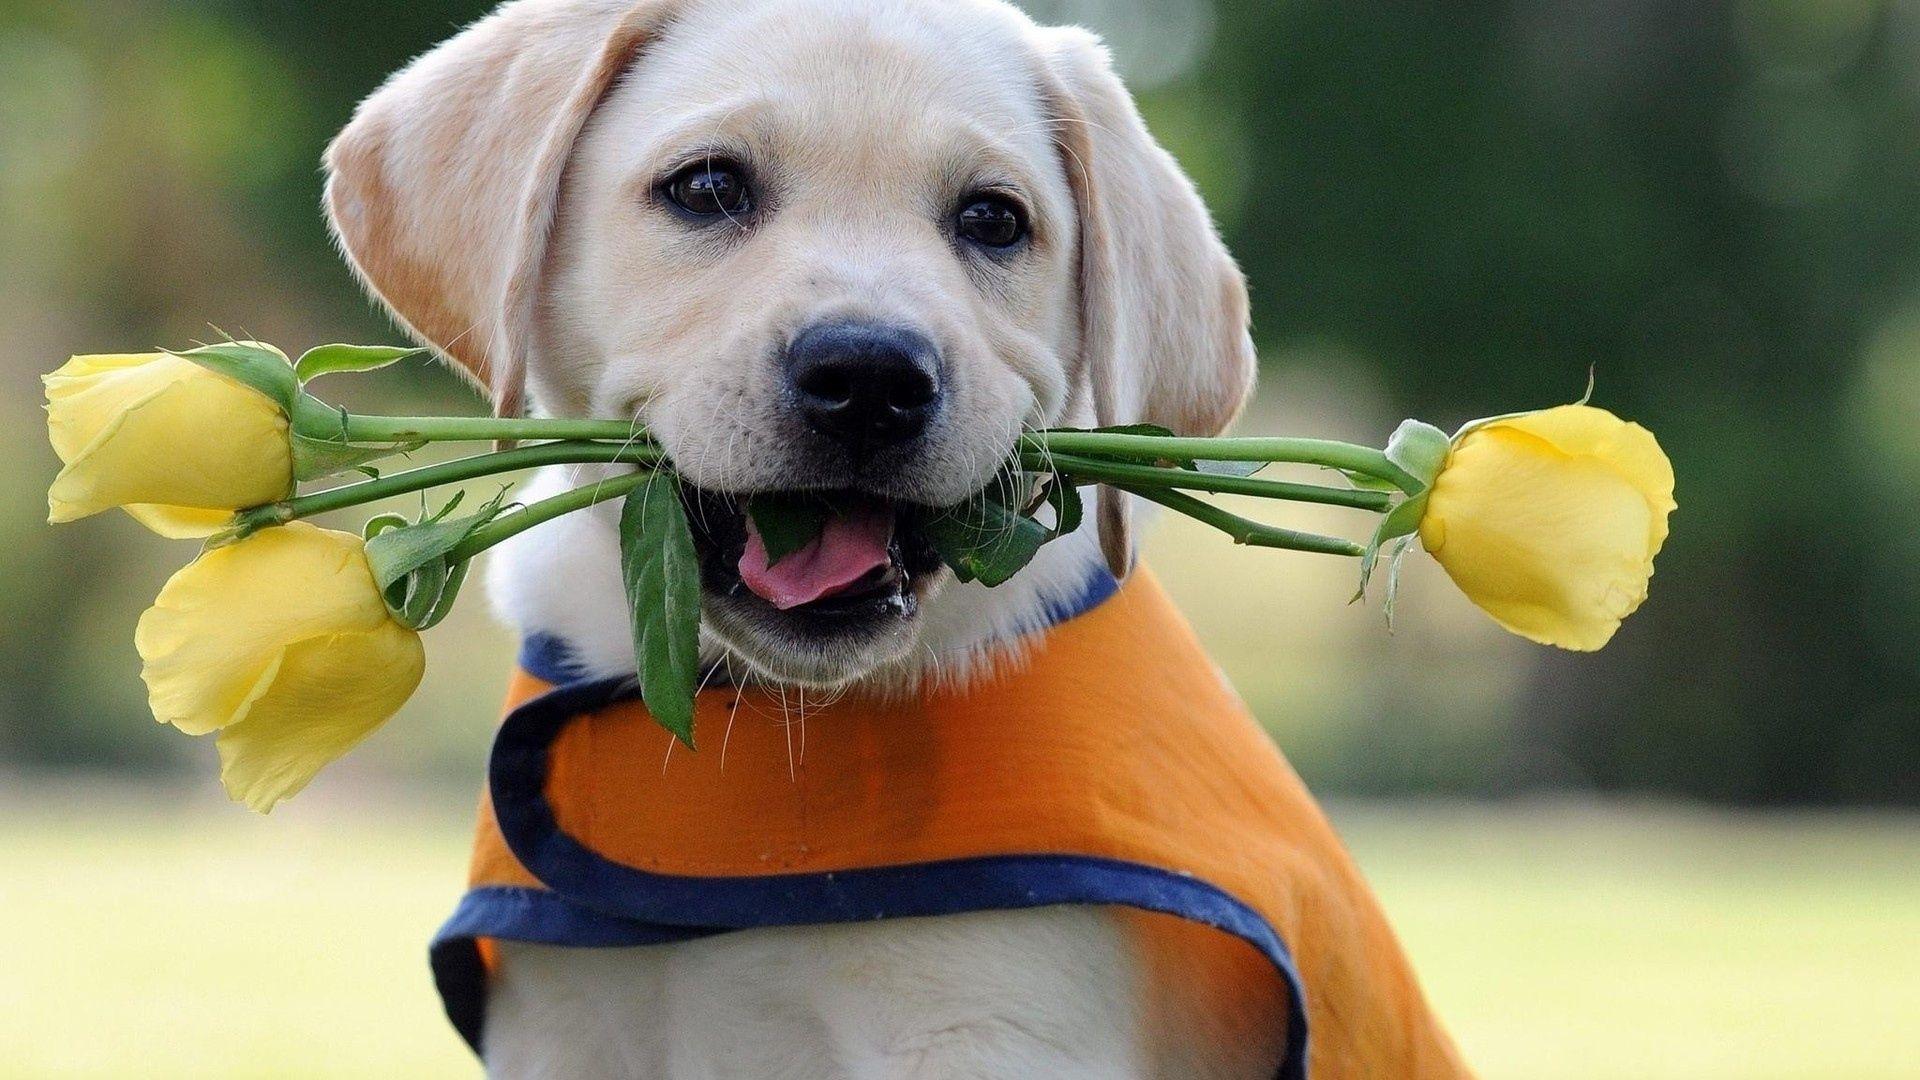 Full Hd 1080p Labrador Wallpapers Hd Desktop Backgrounds 1920x1080 Cute Animals Puppies Labrador Puppy